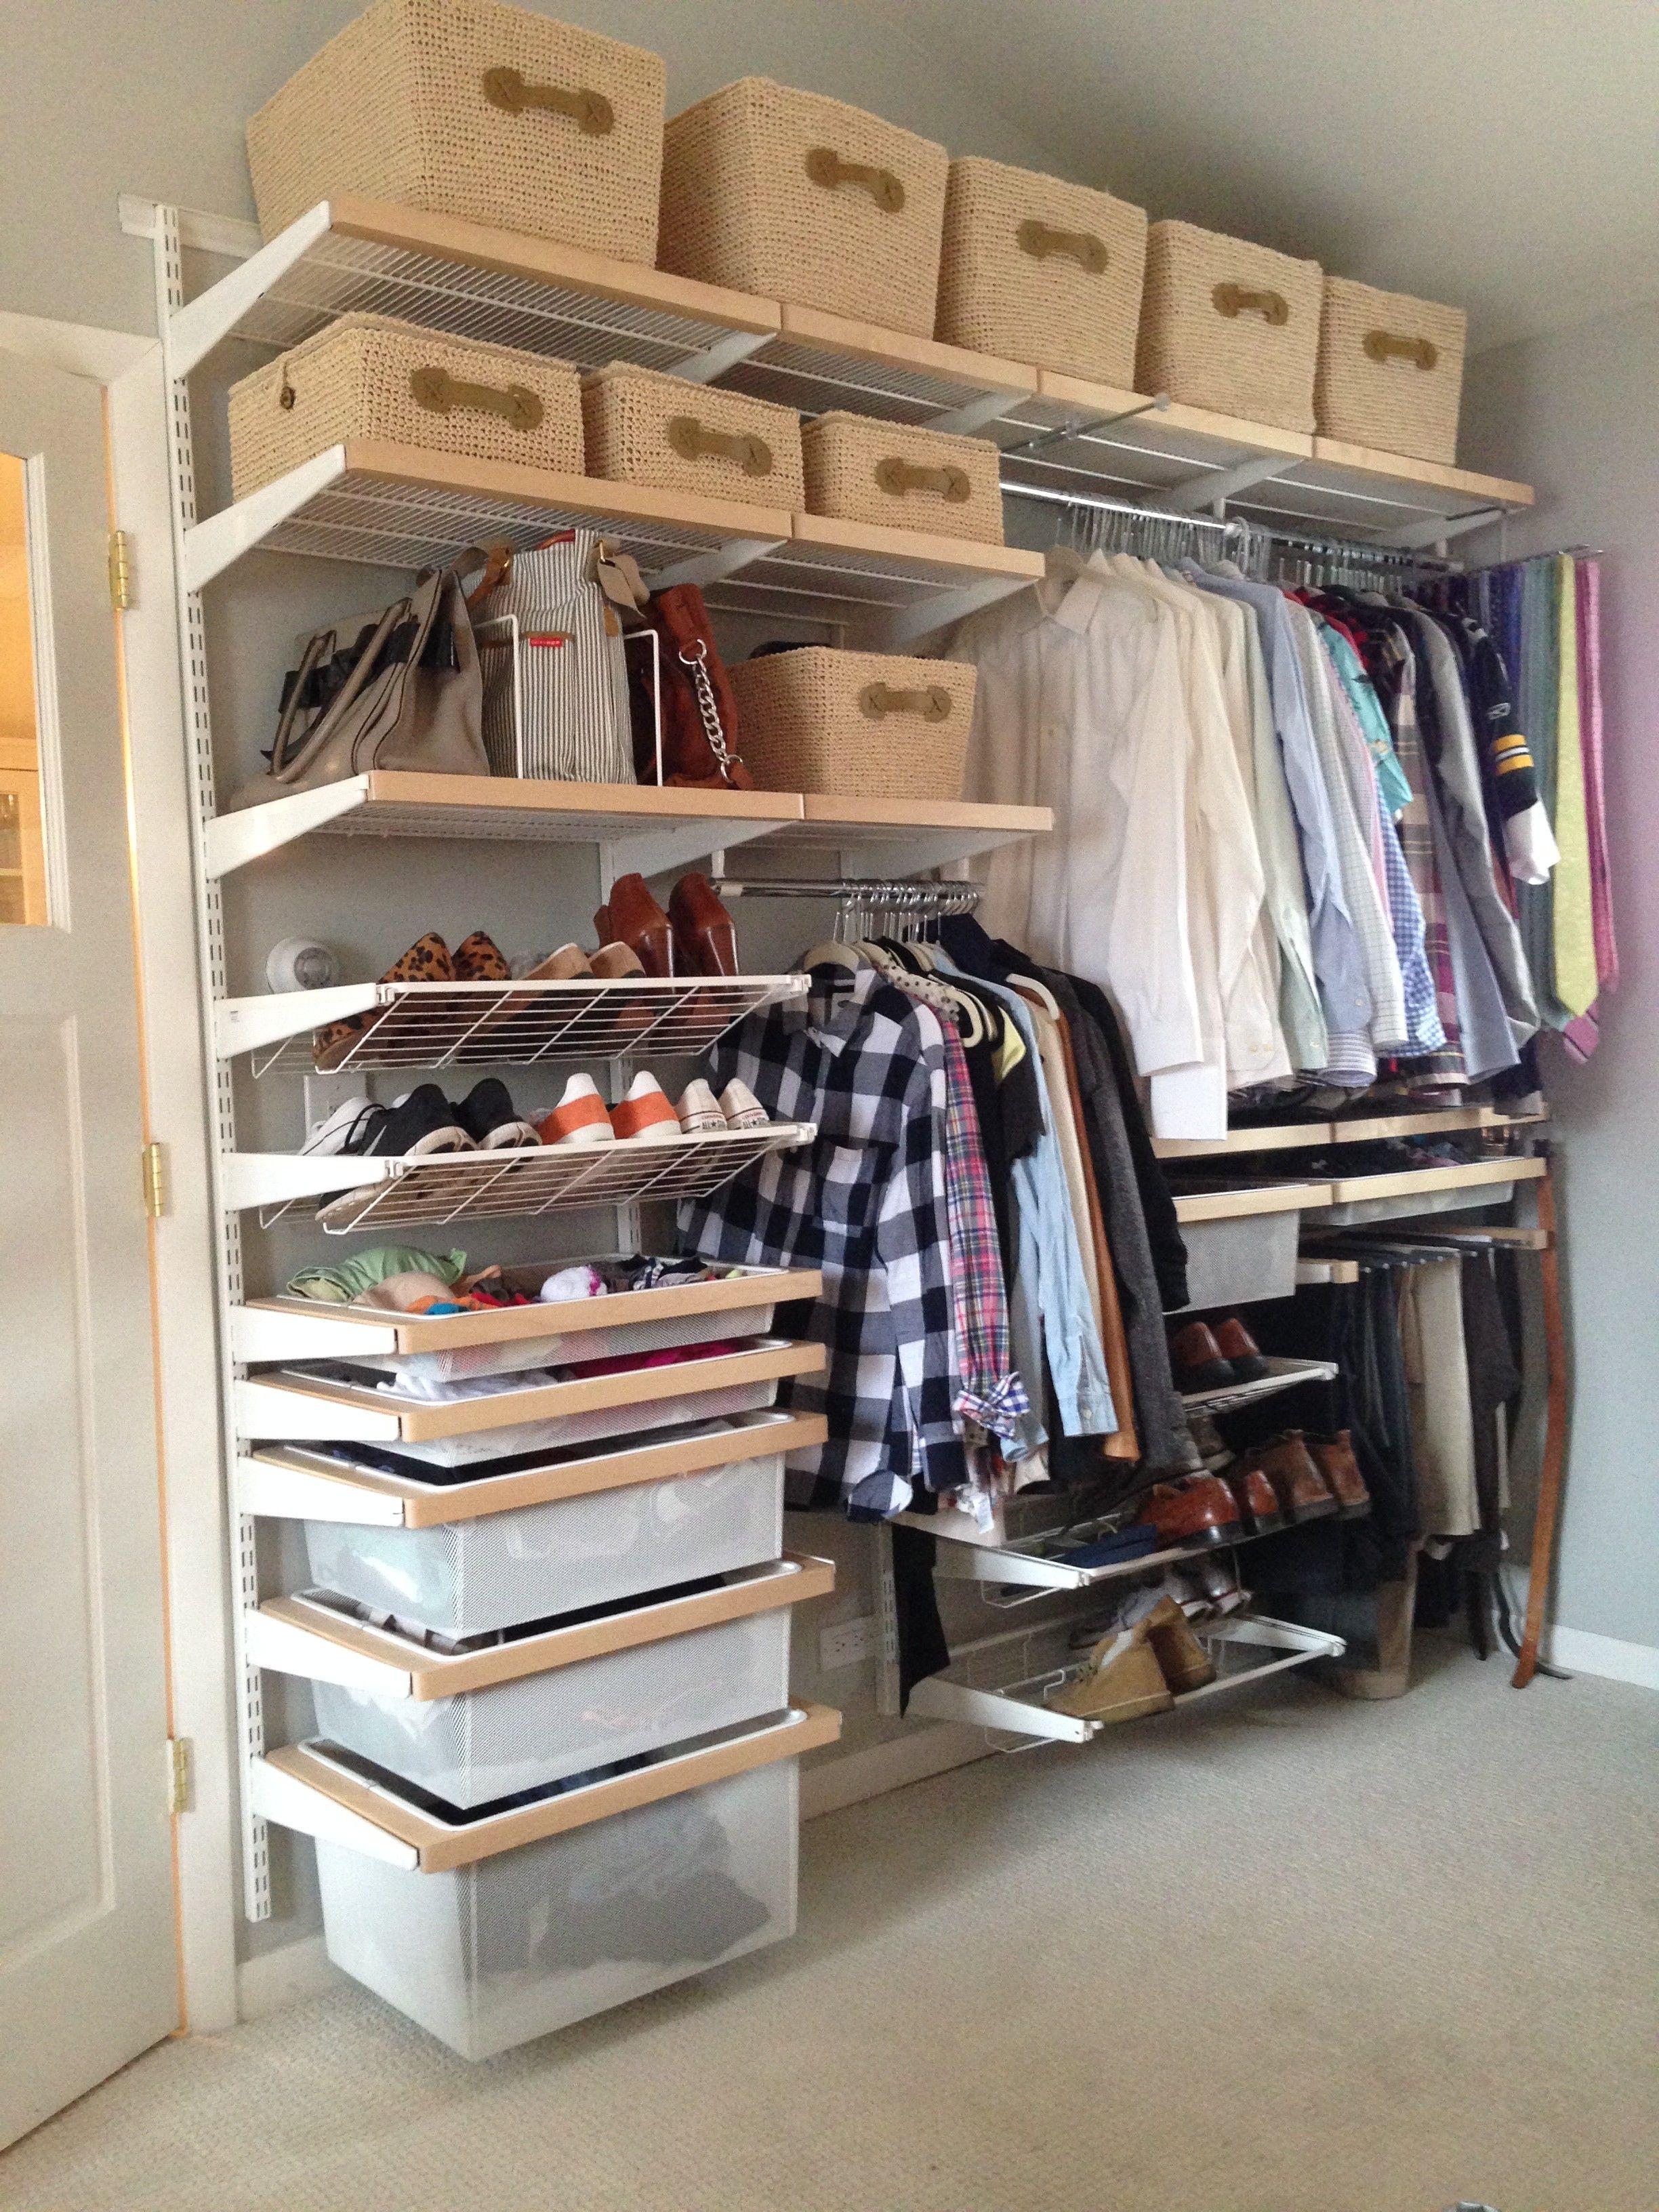 Lowes Closet Design : lowes, closet, design, Do-it-yourself, Custom, Closet, Organization, Systems, Design,, Installation,, Lowes, System,, Rubbermaid